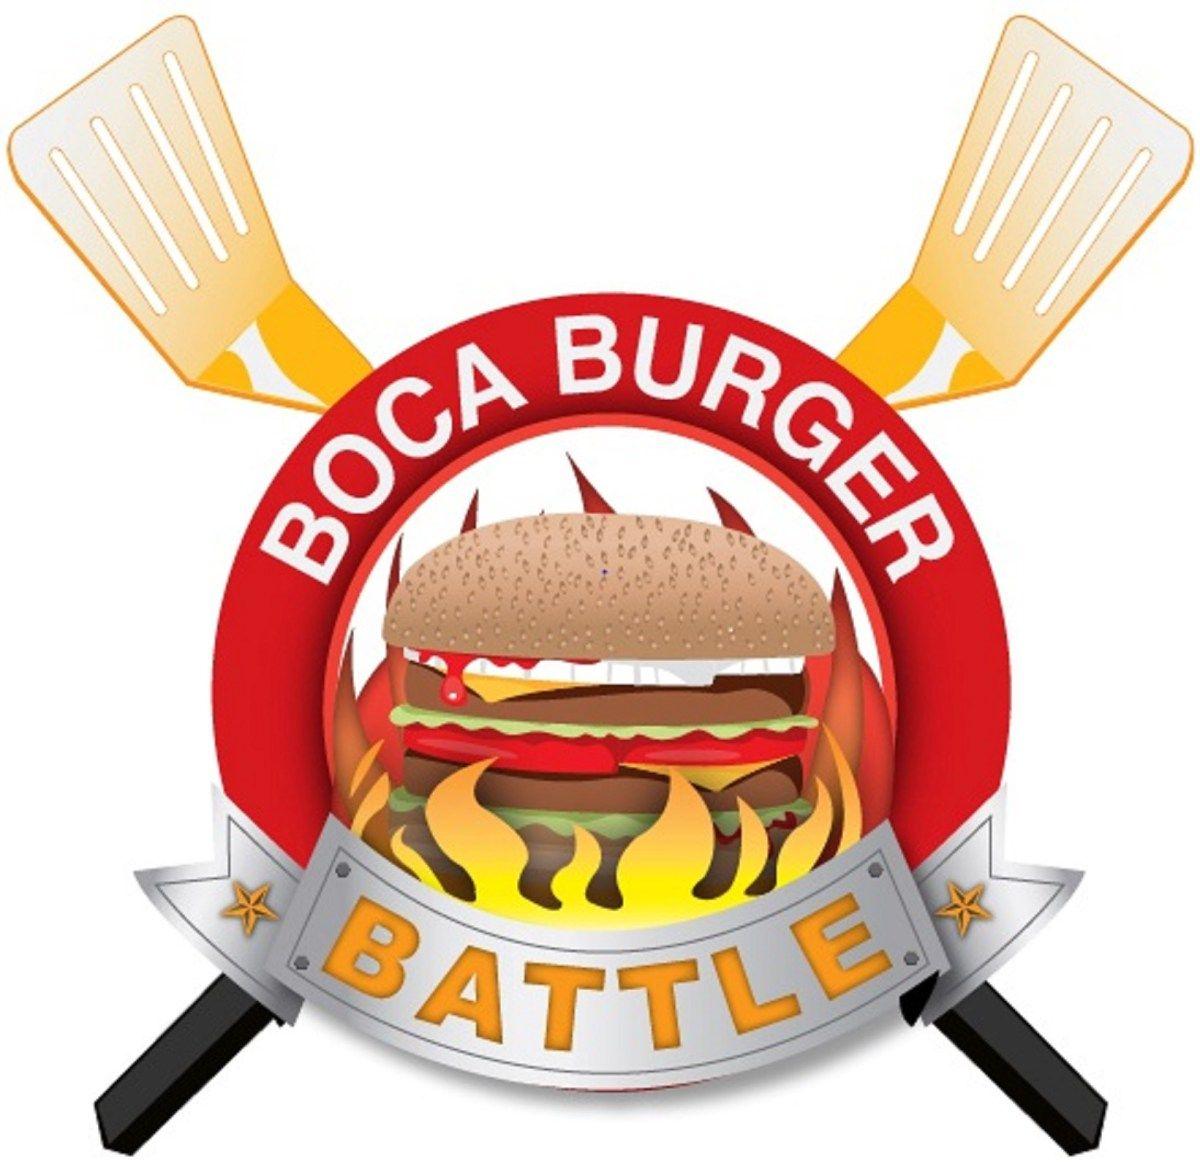 Boca Burger Battle A Grilling Affair Returns This Saturday July 16 Boca Burger Boca Raton Restaurants Burger